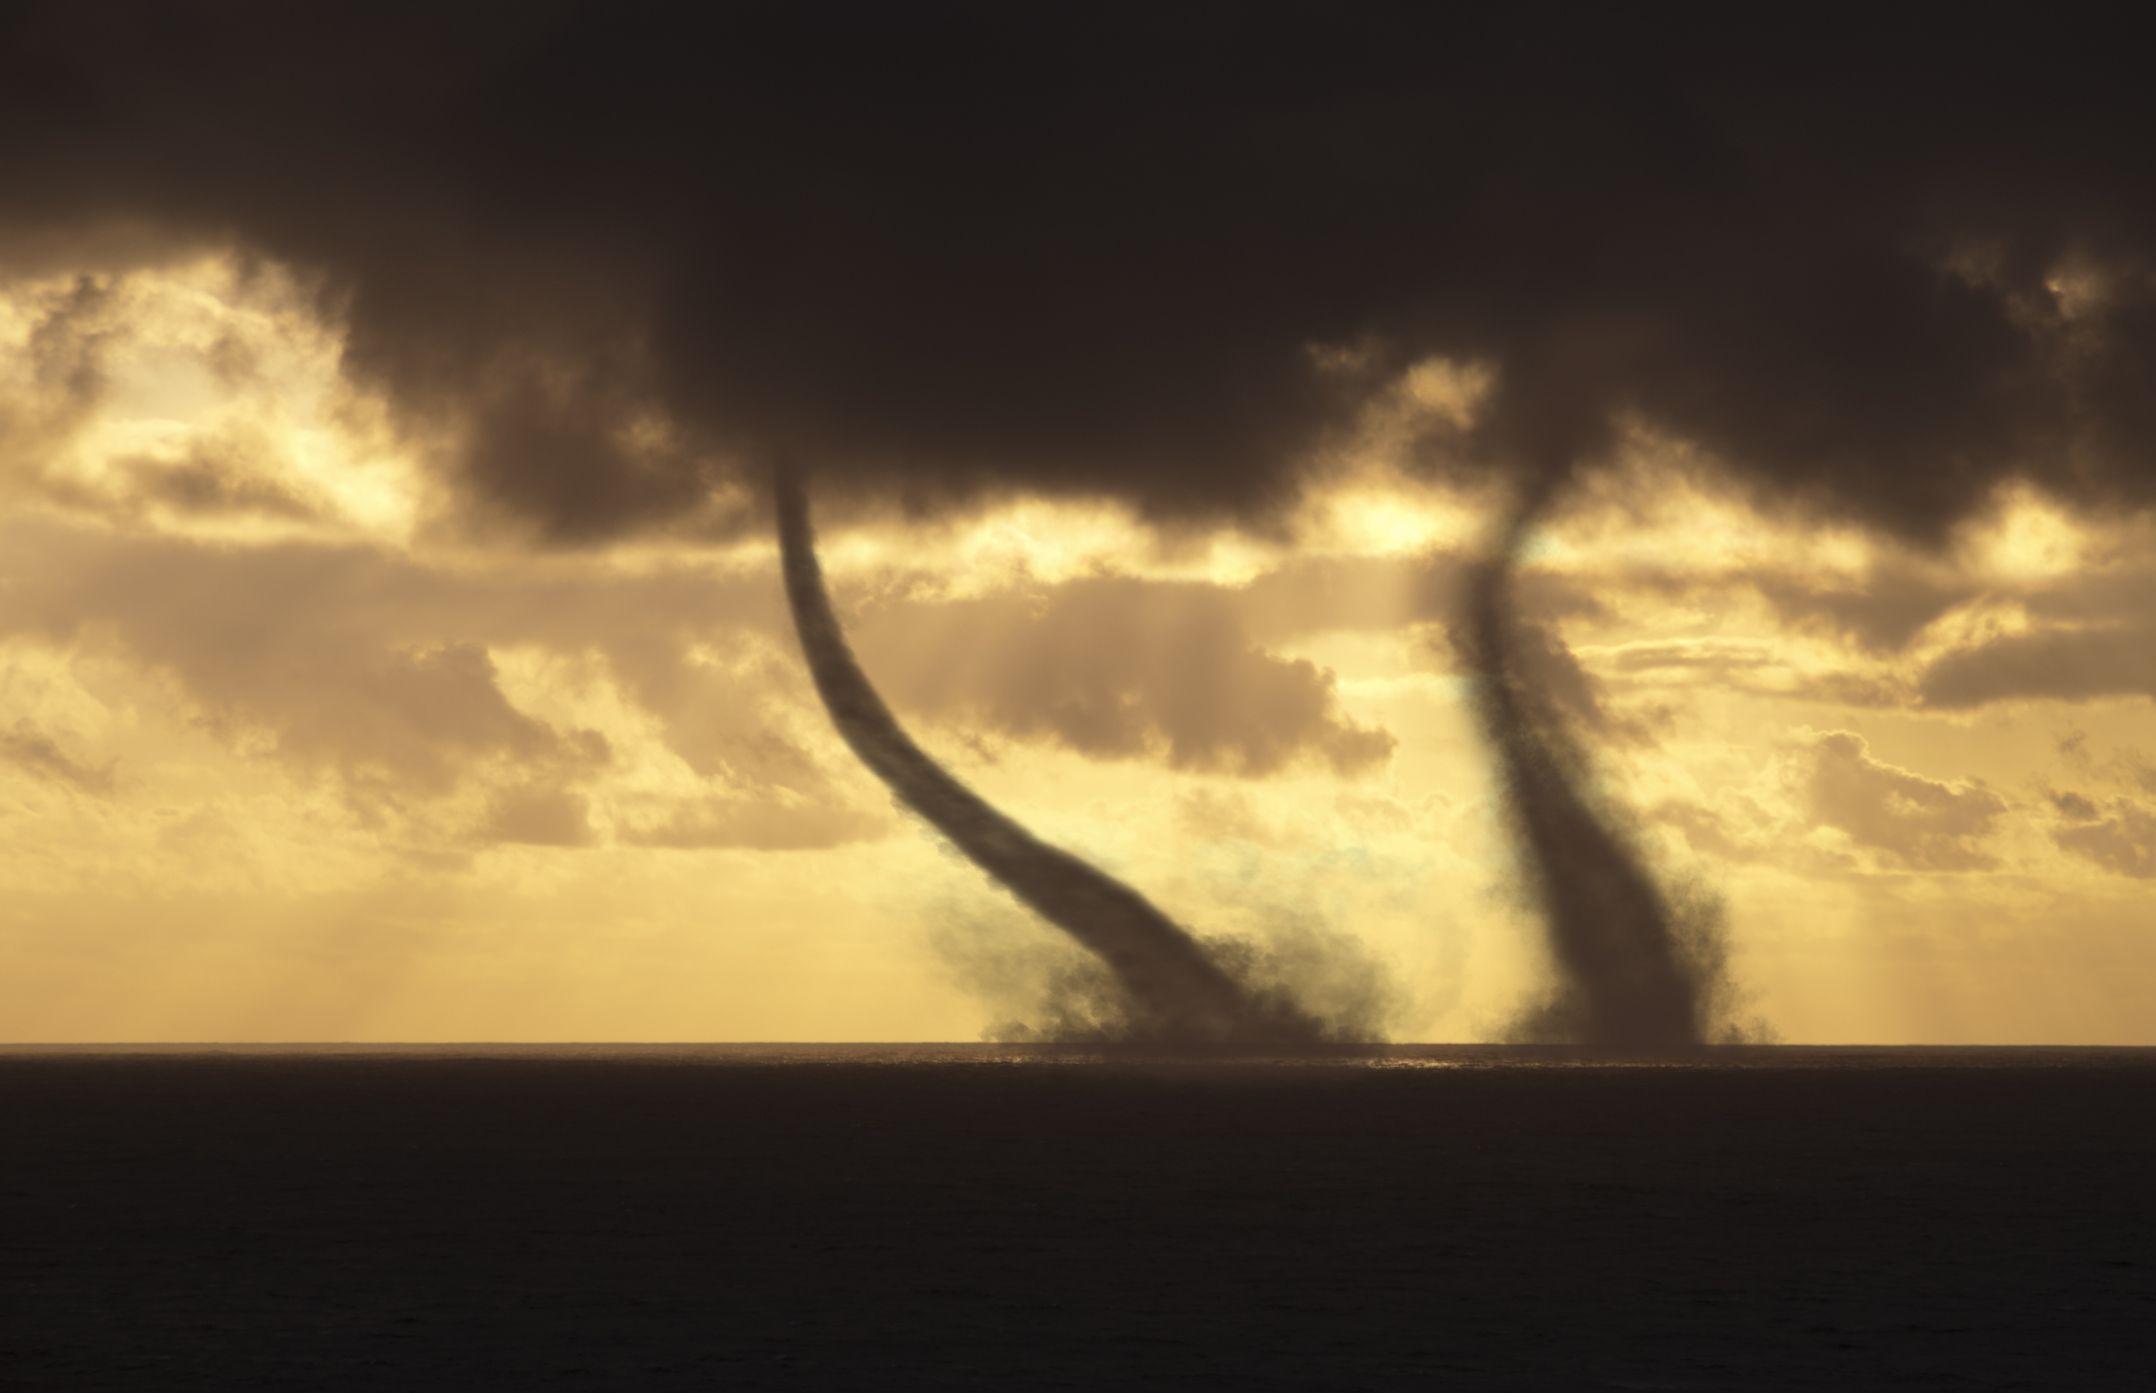 Debris Clouds Visual Cues Of A Tornado Touchdown